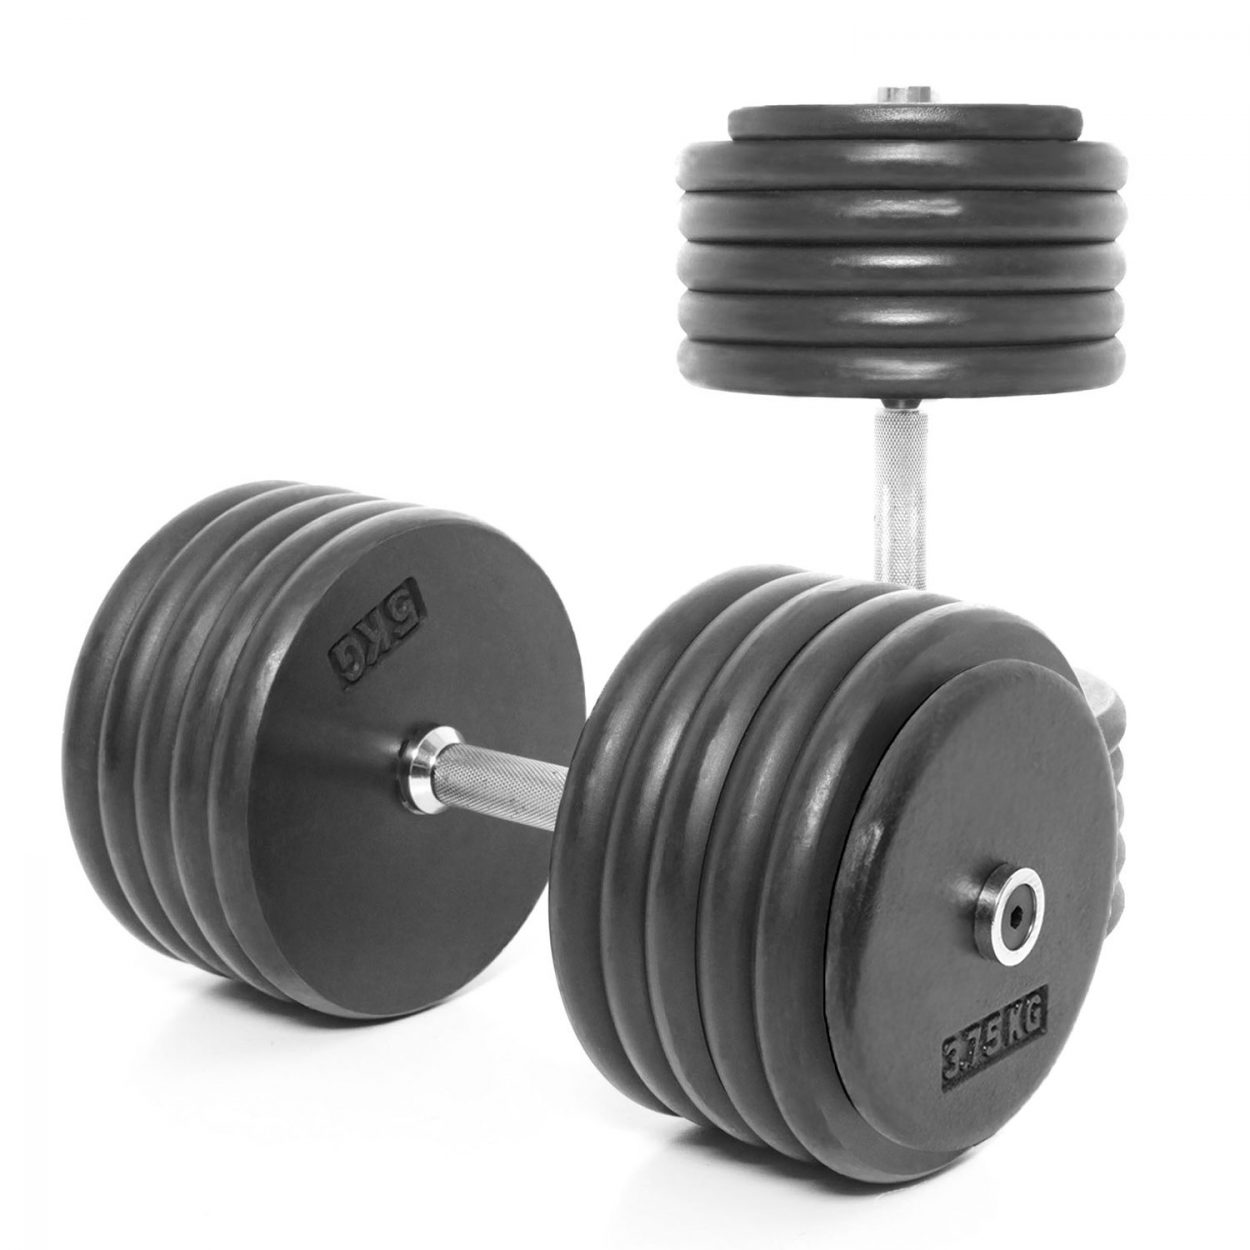 Body Power Pro-style Dumbbells 57.5kg (x2)